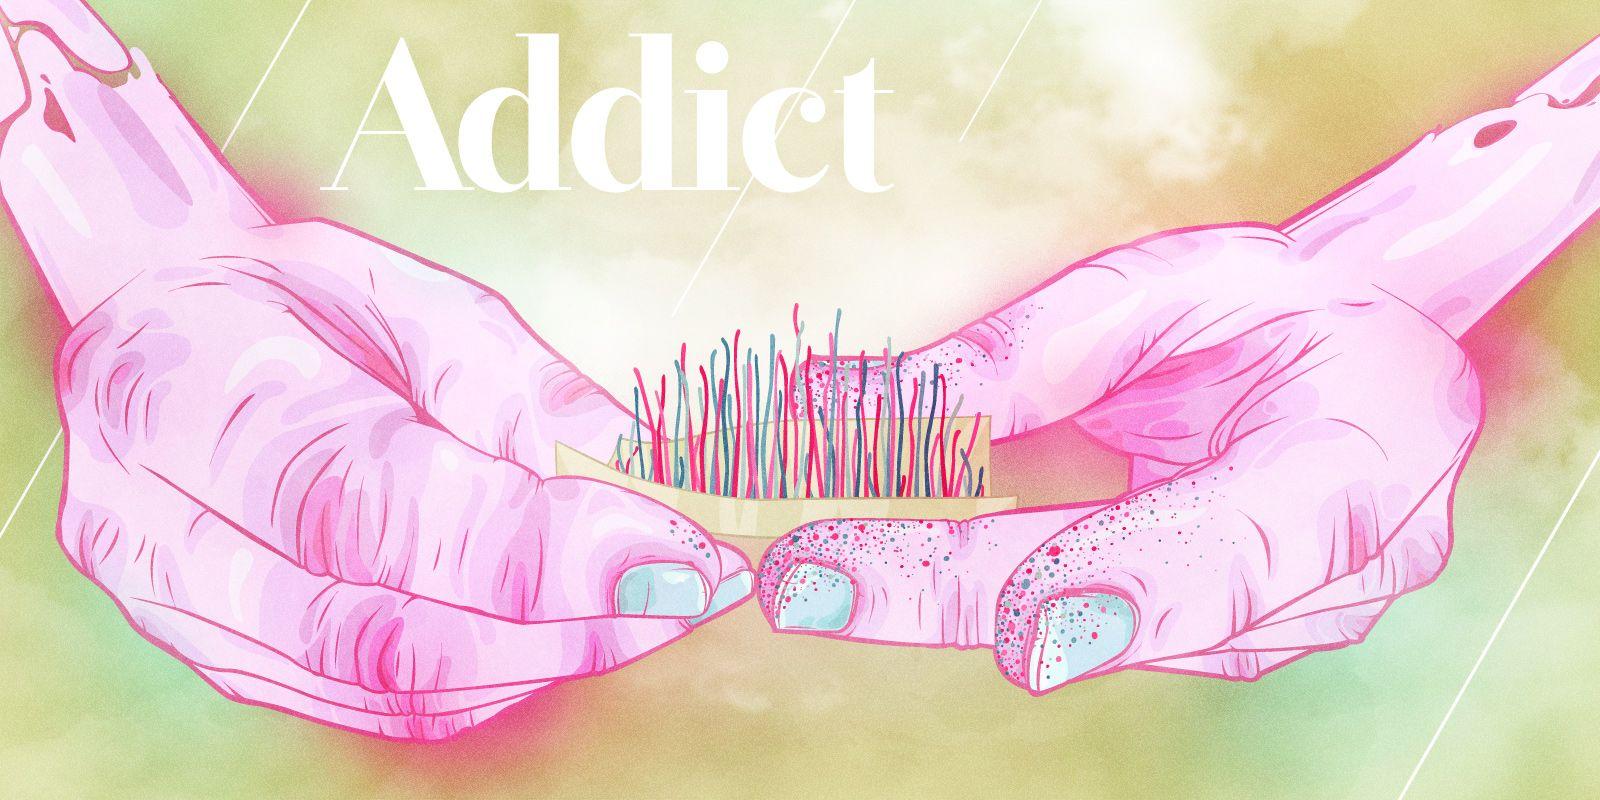 Sylvain Combe - Addict #illustration #hand #cigarette #tabac